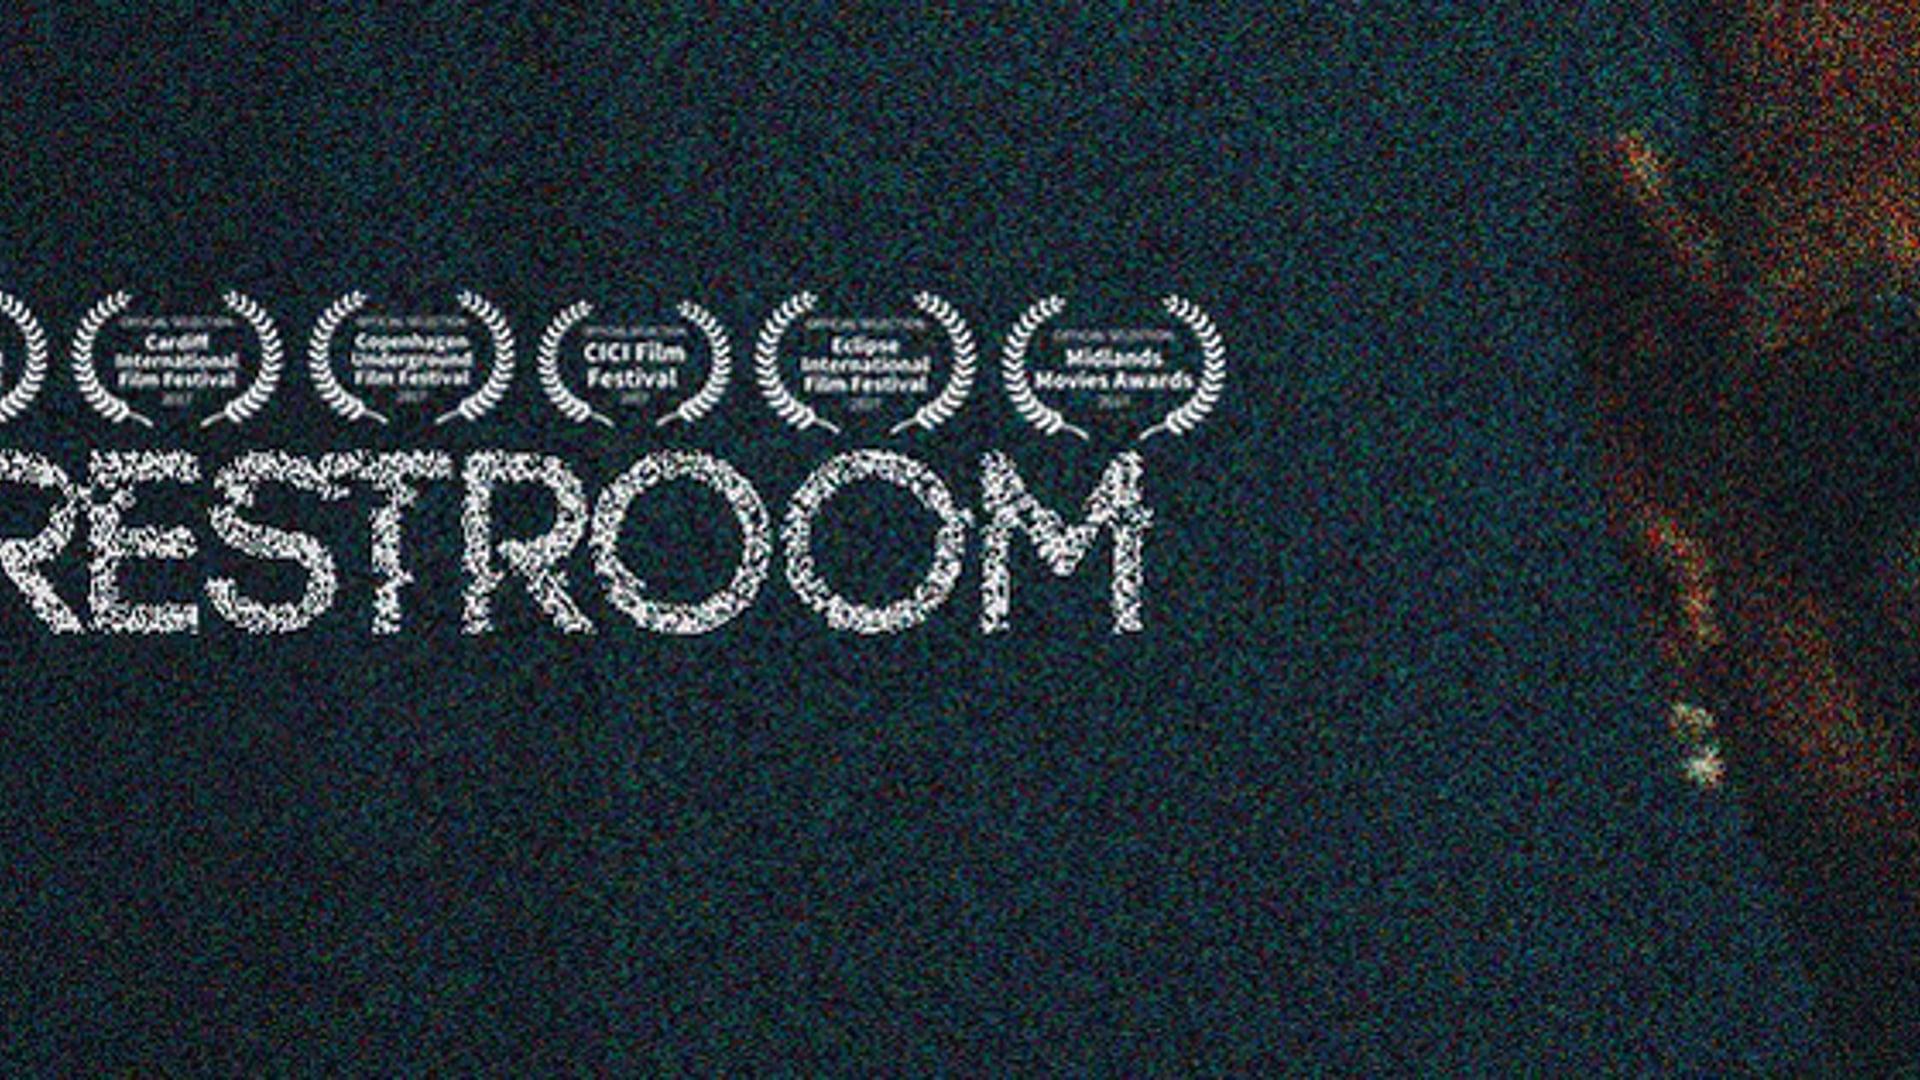 Restroom (British Short Film 2017)